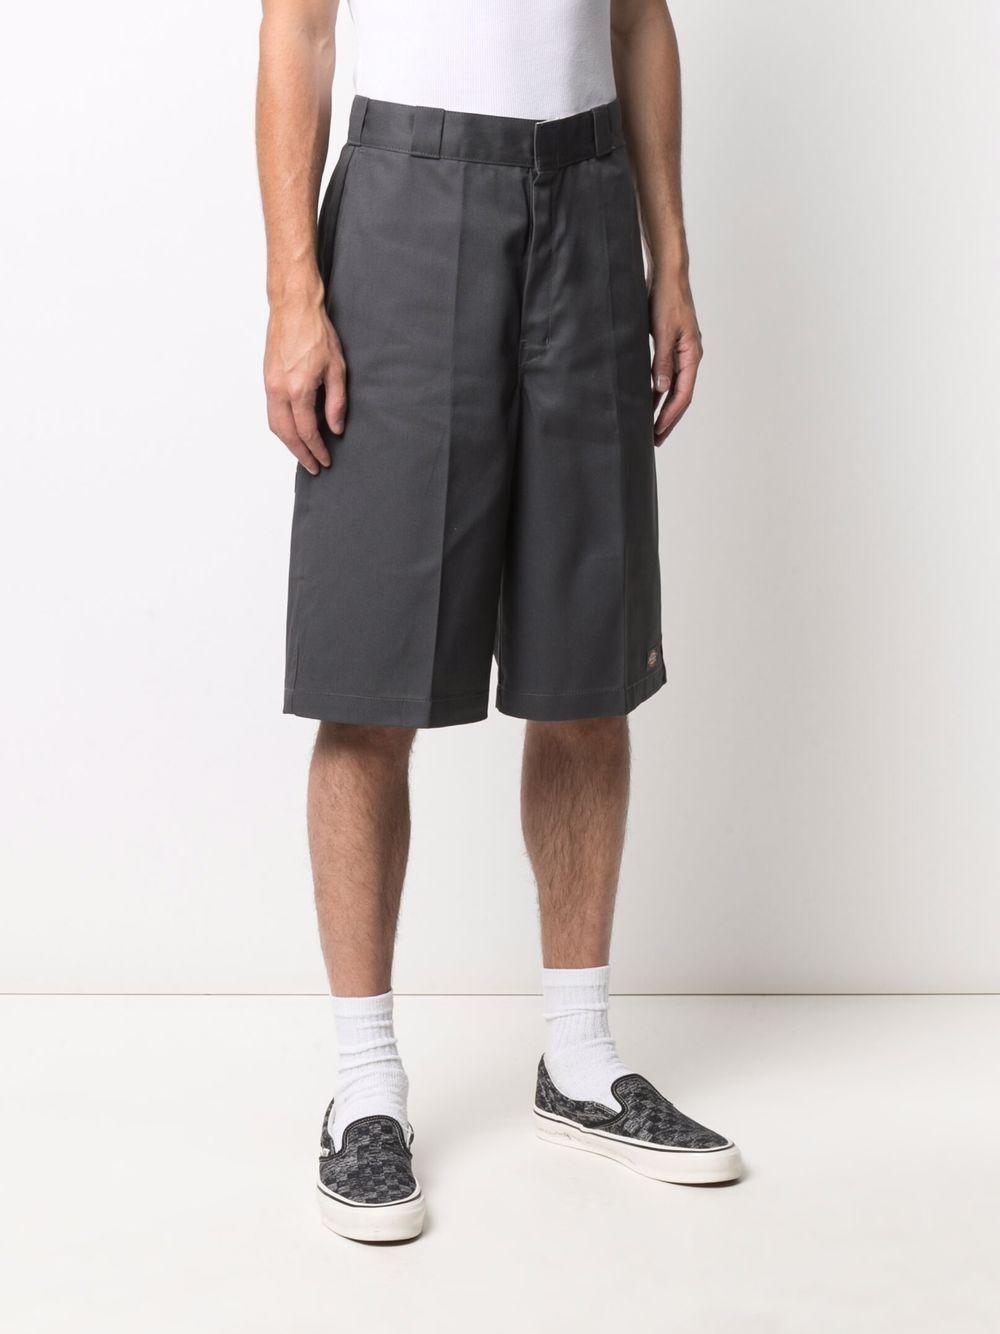 shorts man gray in cotton DICKIES | Shorts | DK42283XCH01